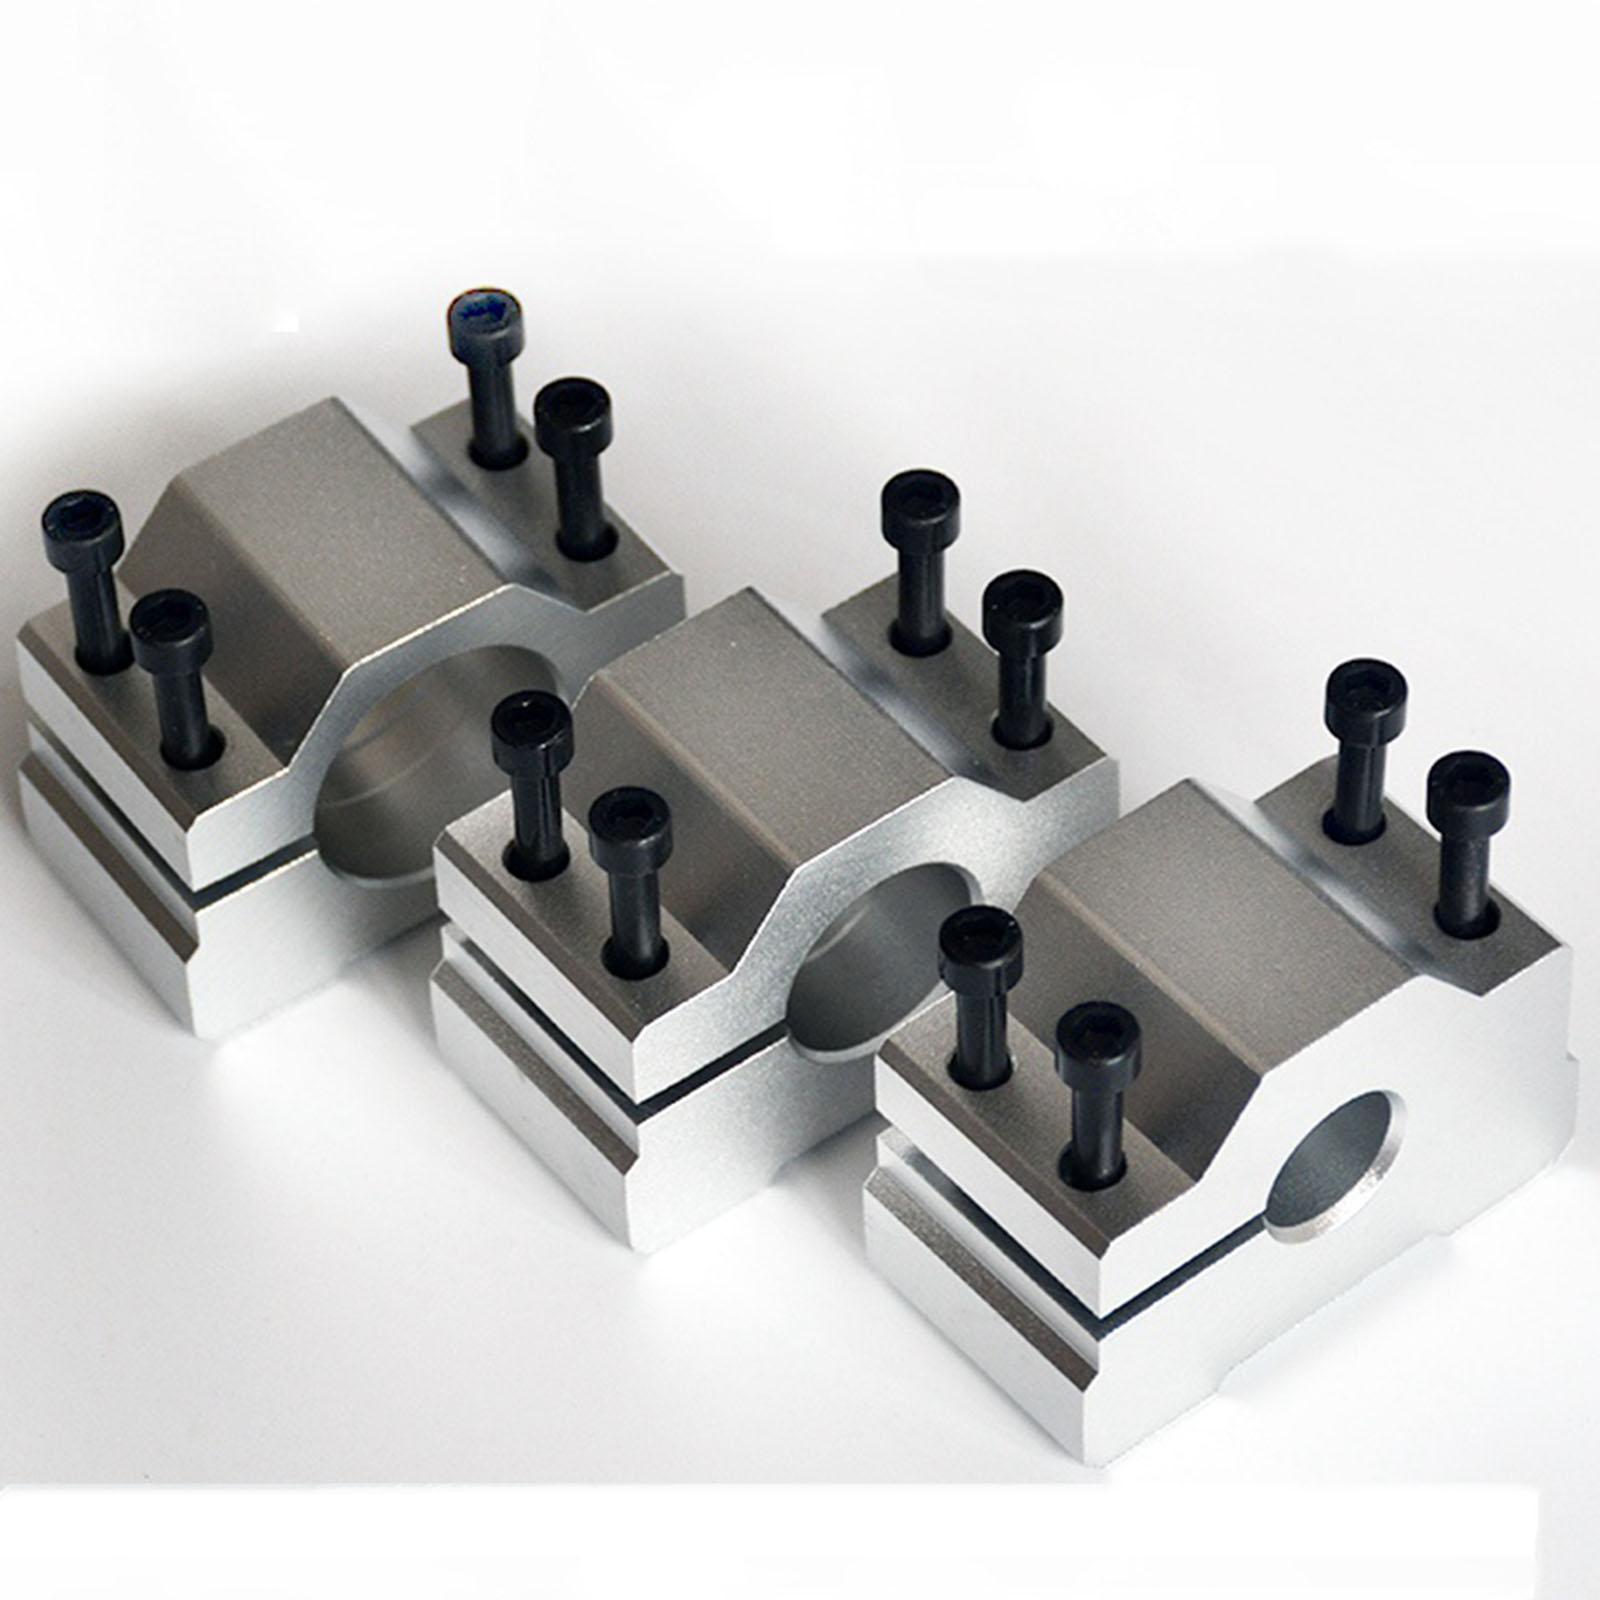 Cast Aluminum 34mm Inner Diameter M6 CNC Engraving Machine Spindle Motor Clamp Cas Fixture Holder Bracket D-Style